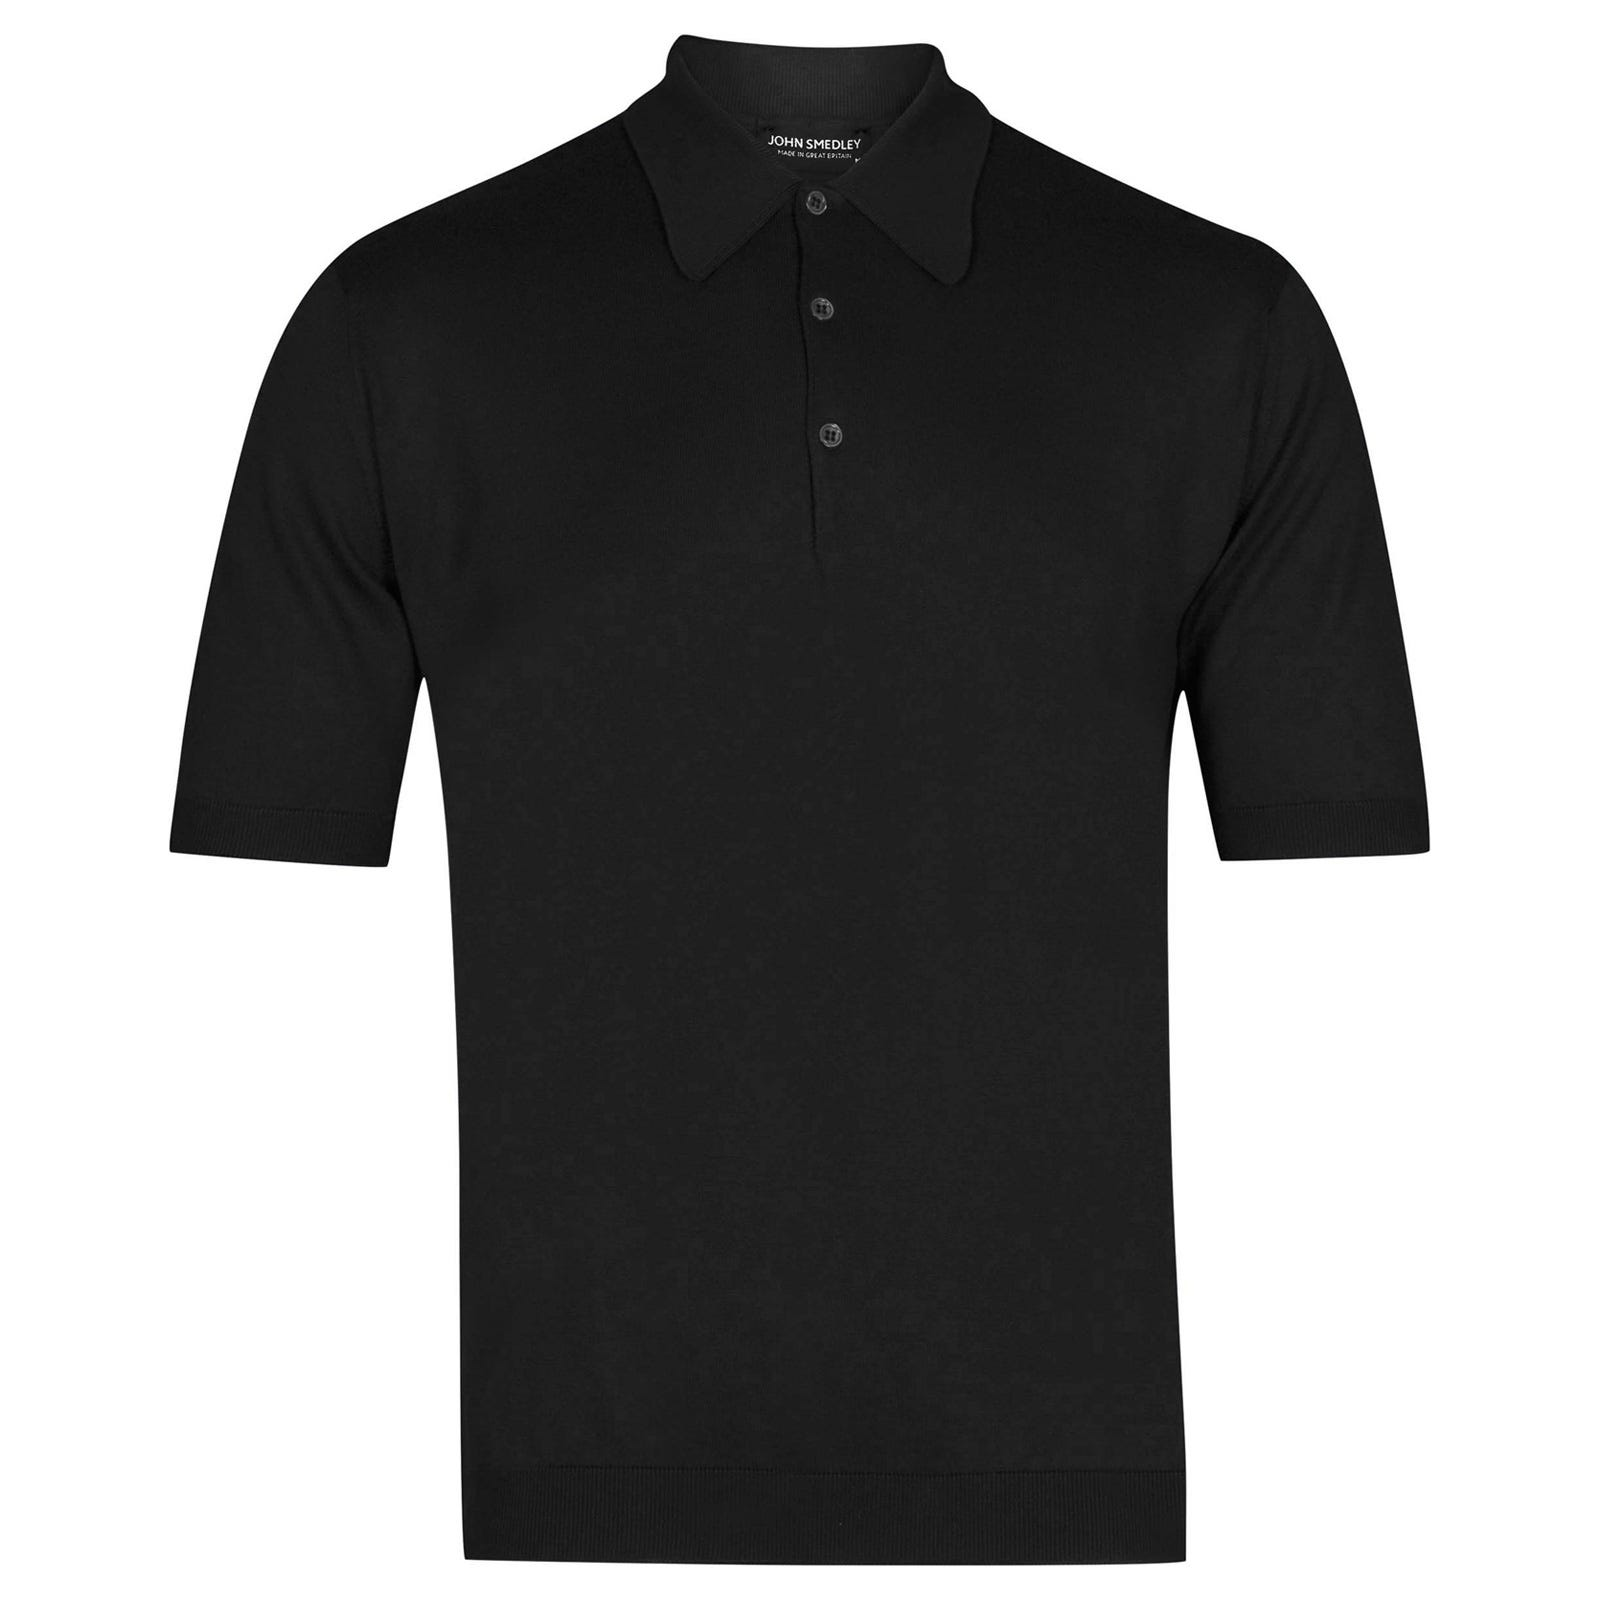 John Smedley Isis Sea Island Cotton Shirt in Black-XXL